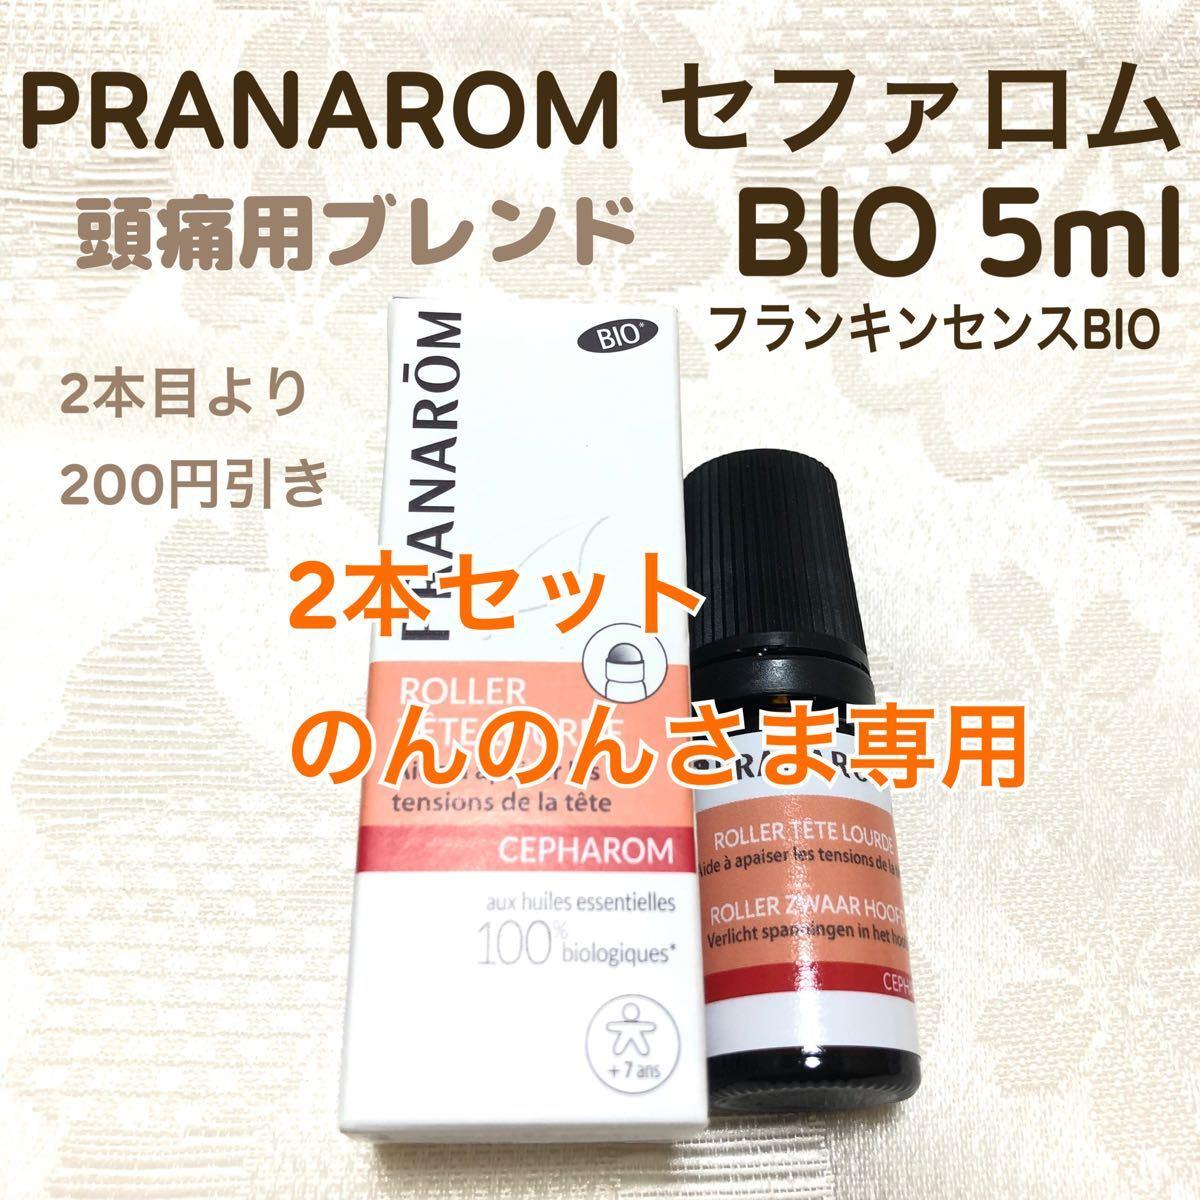 PRANAROM 【セファロム】BIO 頭痛用ブレンドローラー 5ml プラナロム